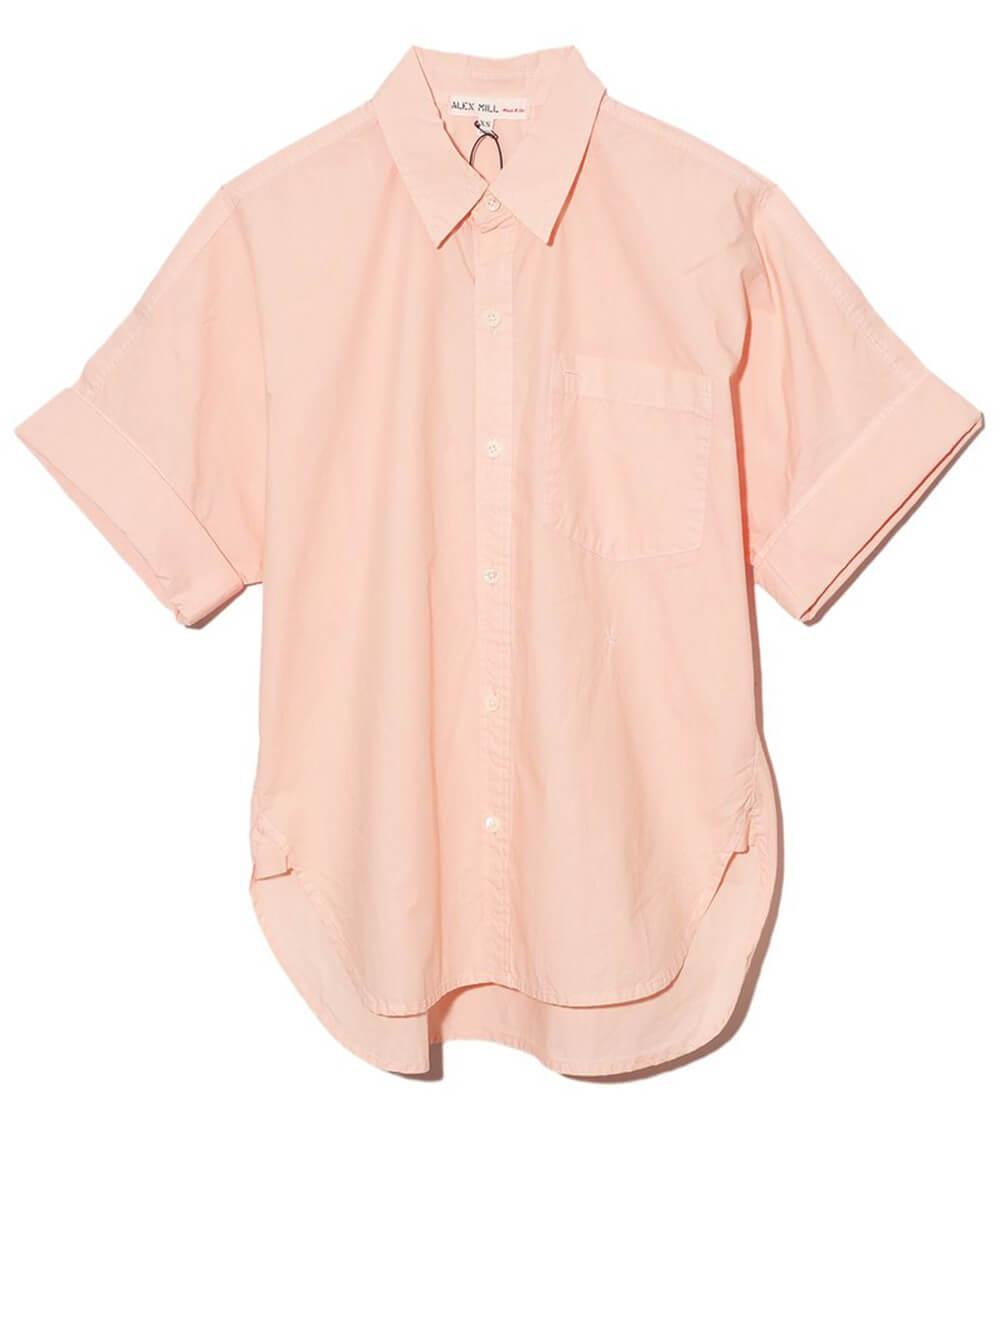 Charlie Shirt In Paper Poplin Item # WS212156